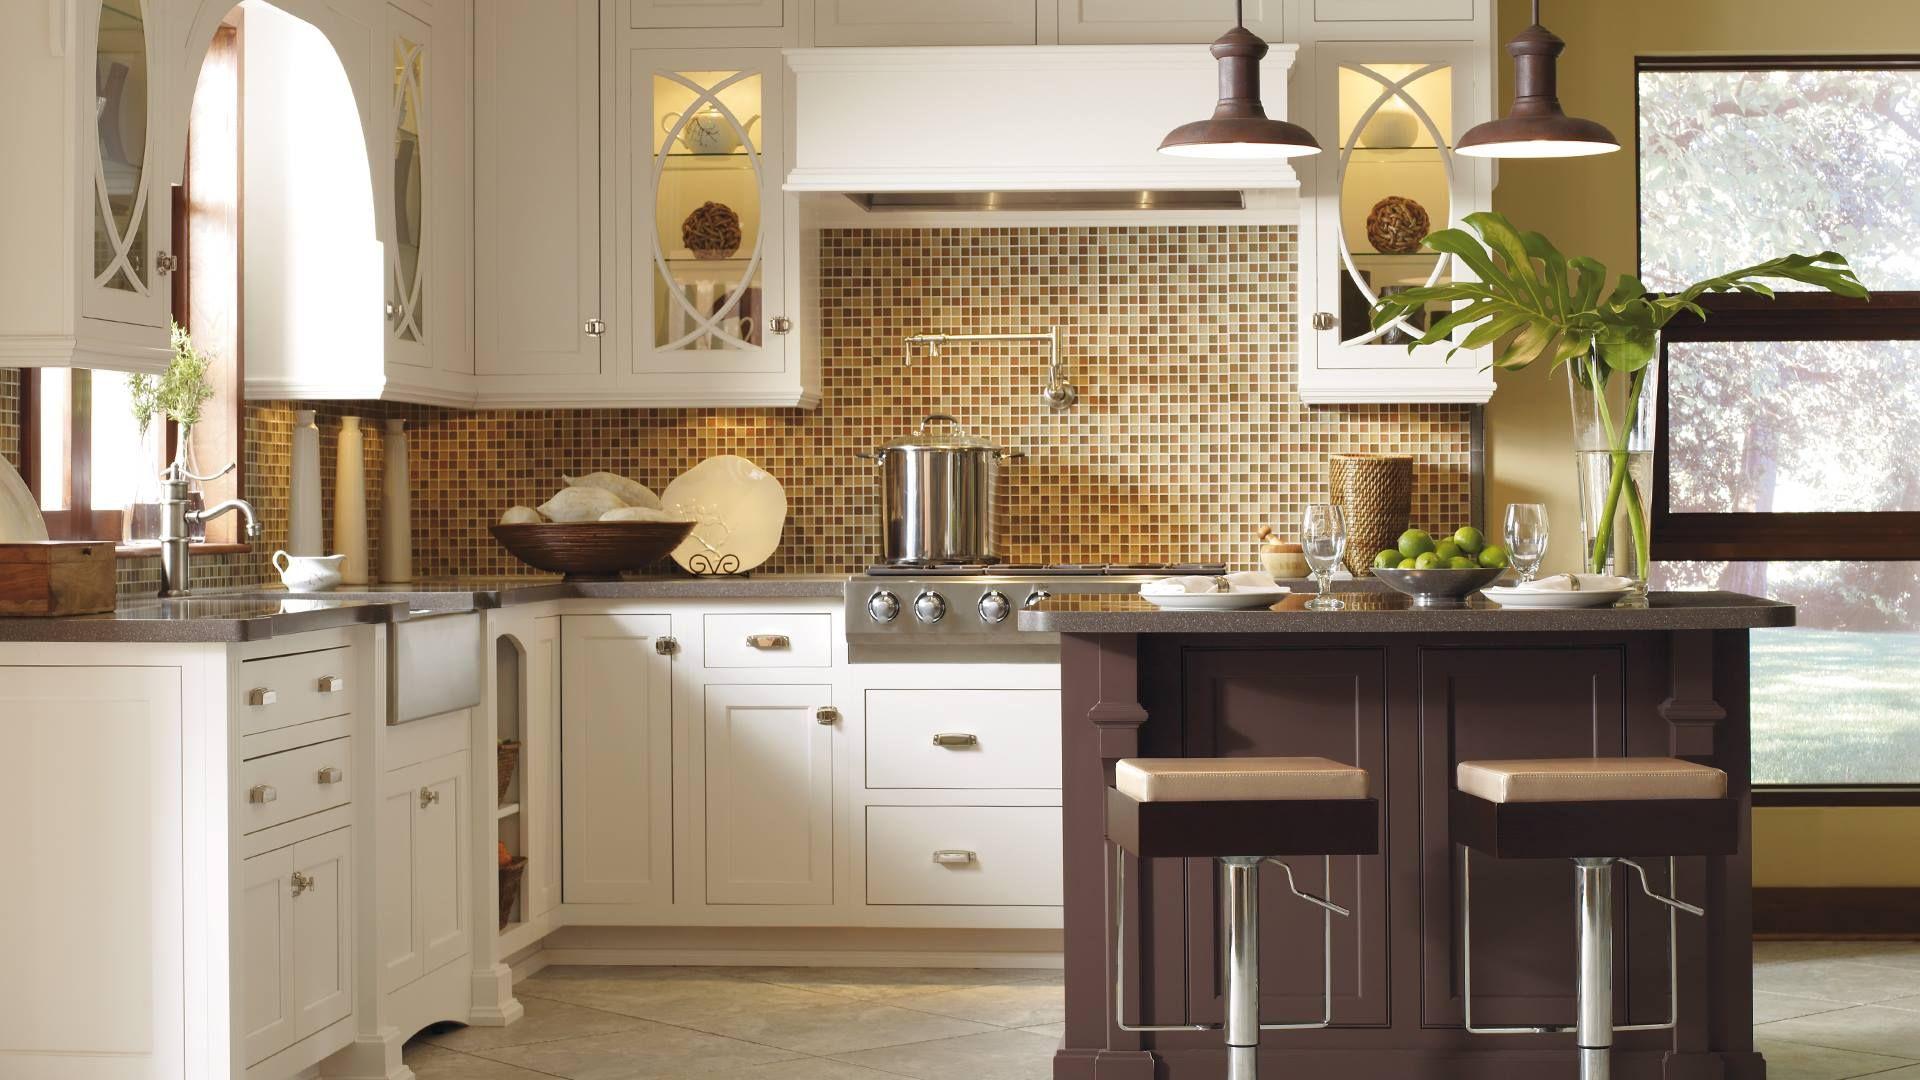 Kitchen Backsplashes - The Kitchen Focal Point - Blog by ...